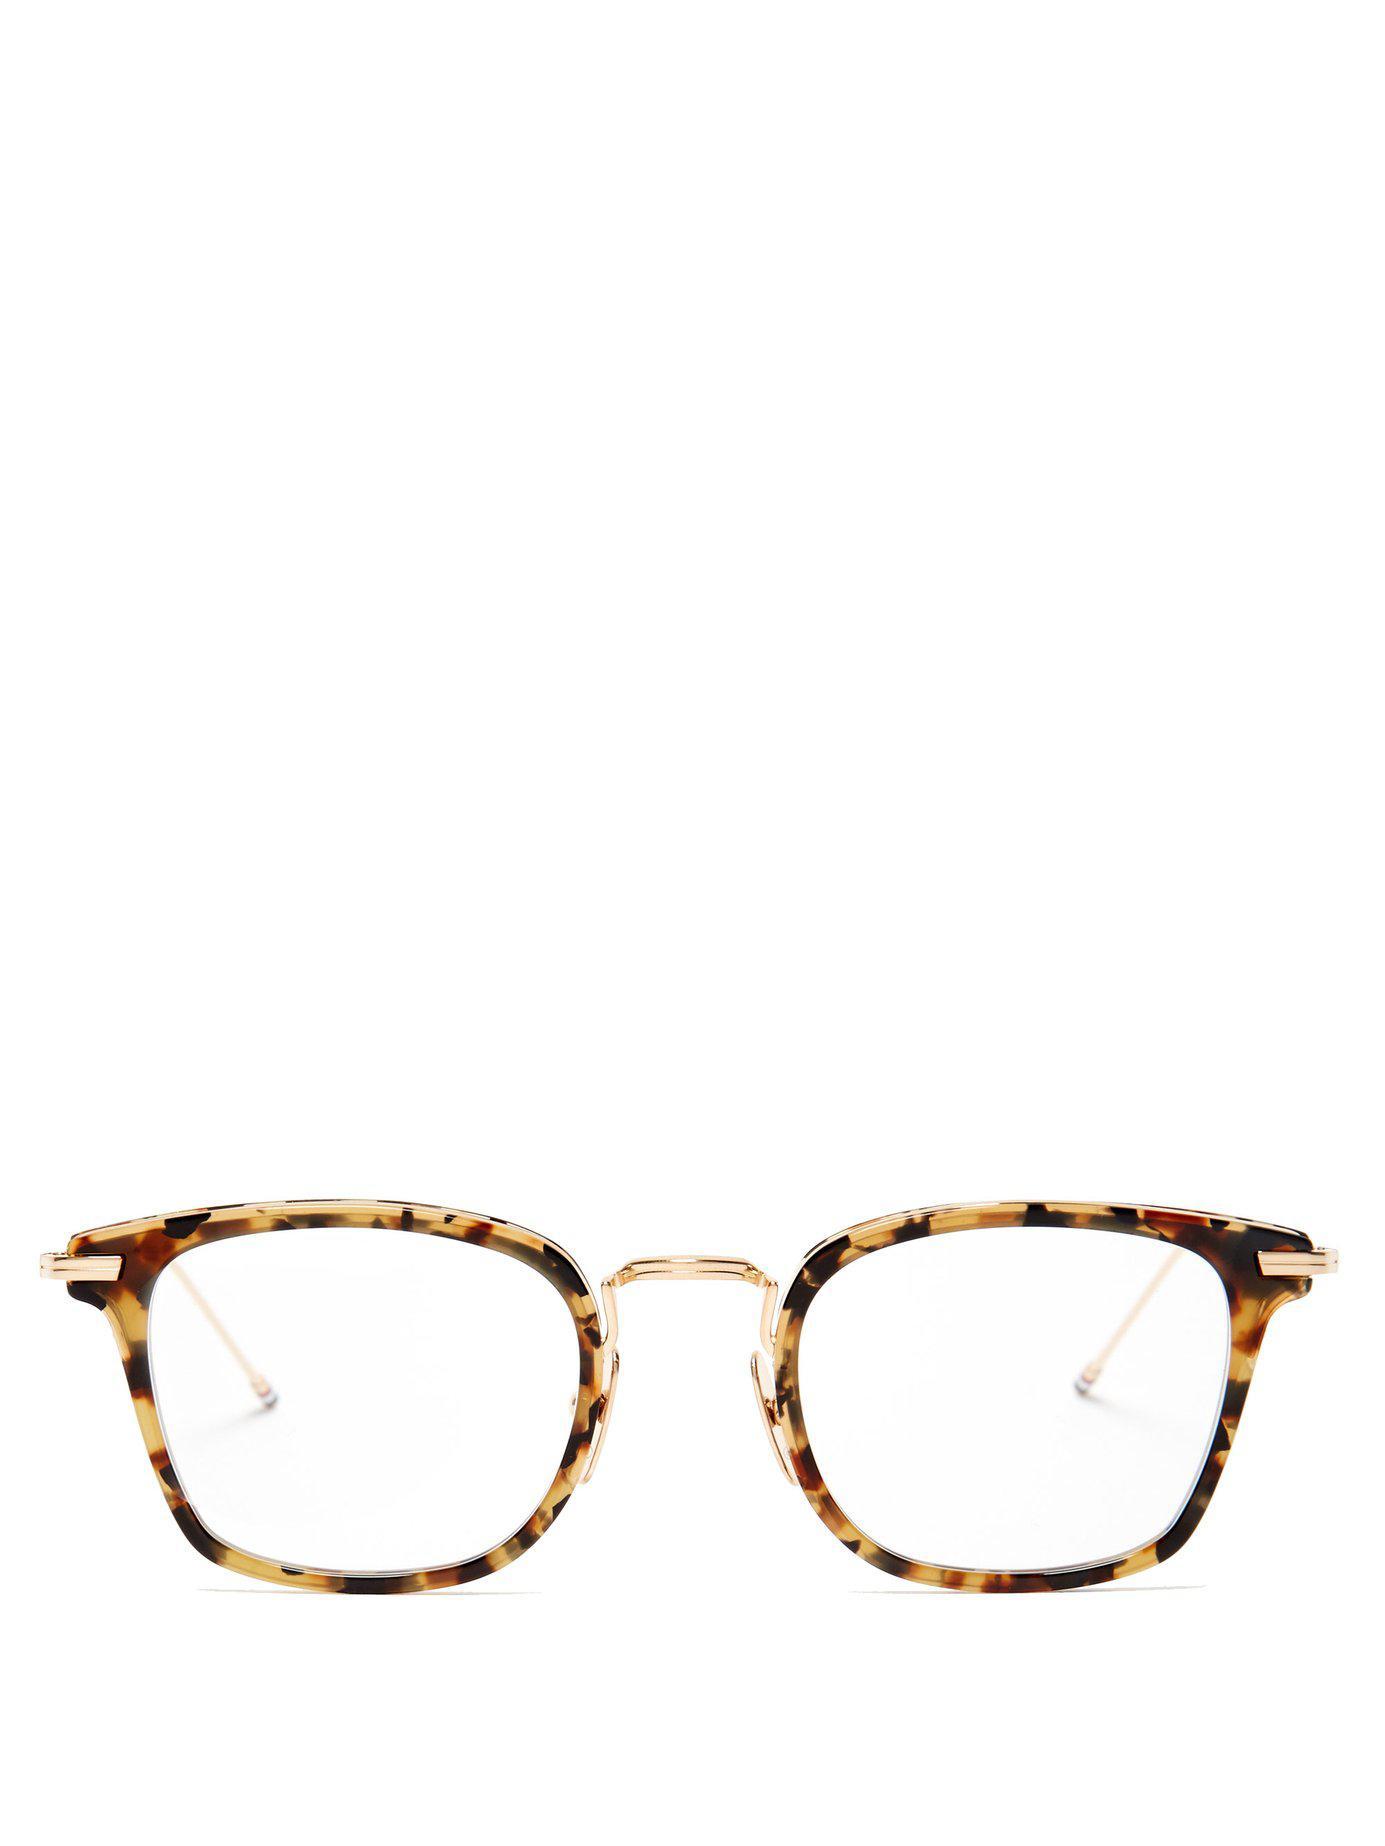 8cb266db6baa Thom Browne. Men s Brown D Frame Tortoiseshell Acetate And Metal Glasses